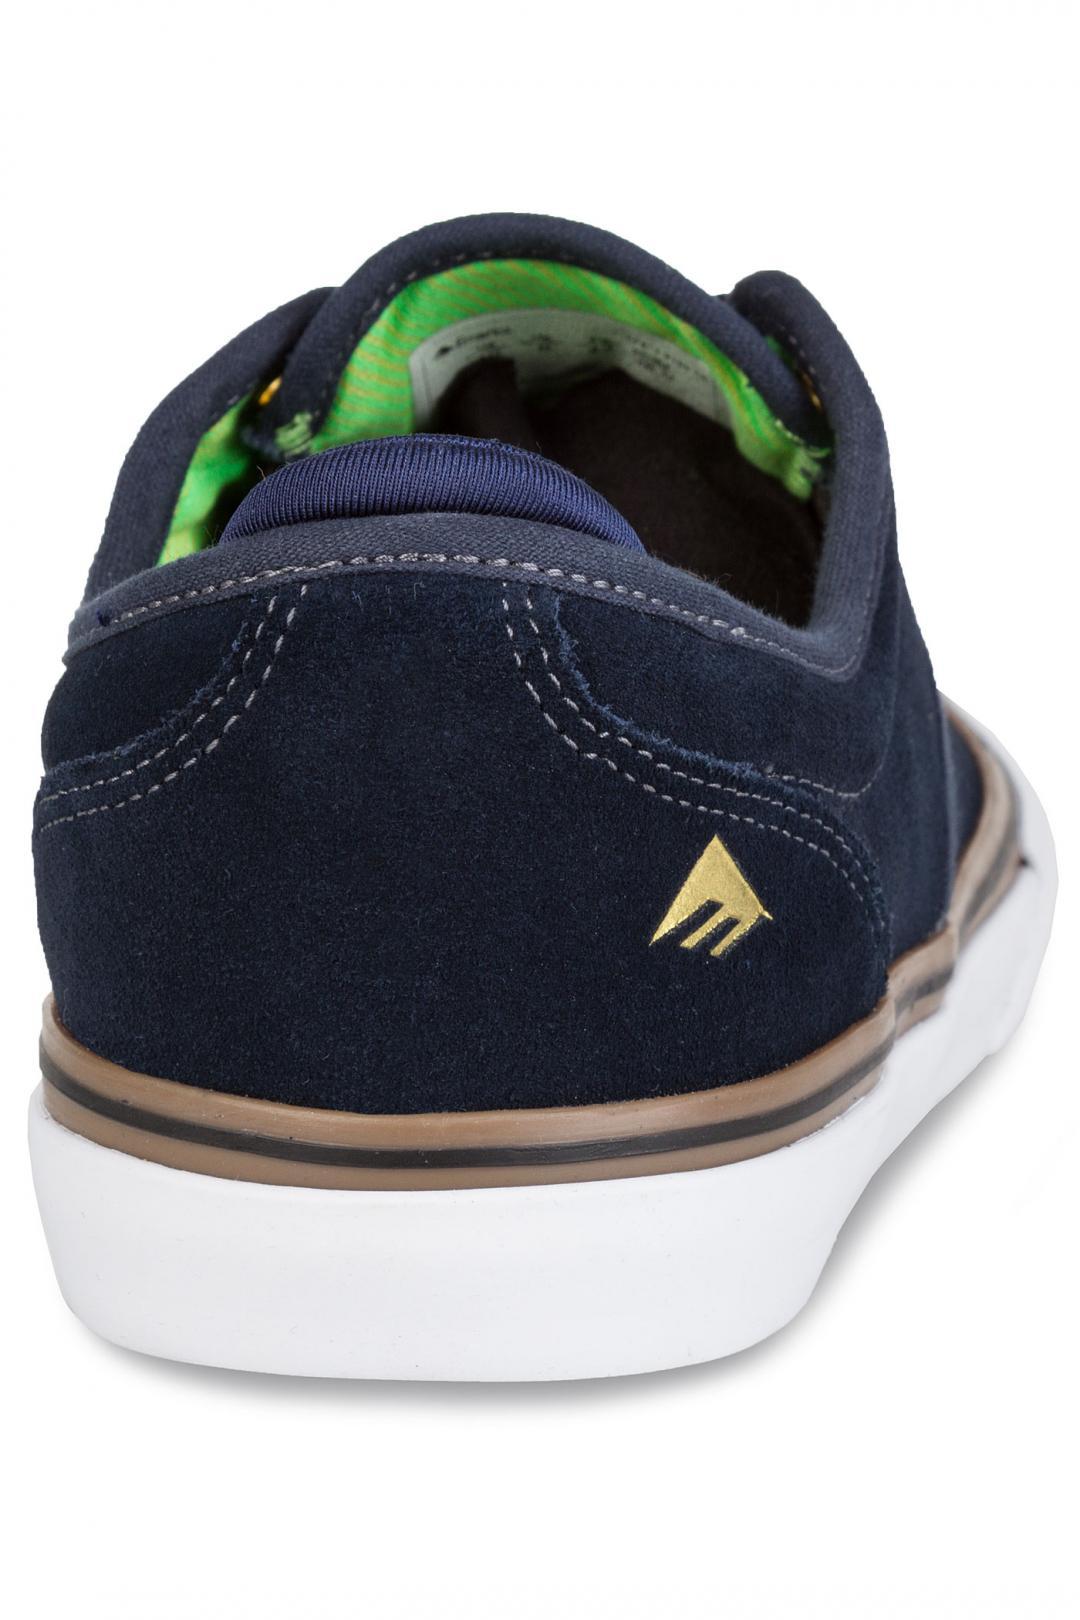 Uomo Emerica Wino G6 navy gum white   Sneakers low top